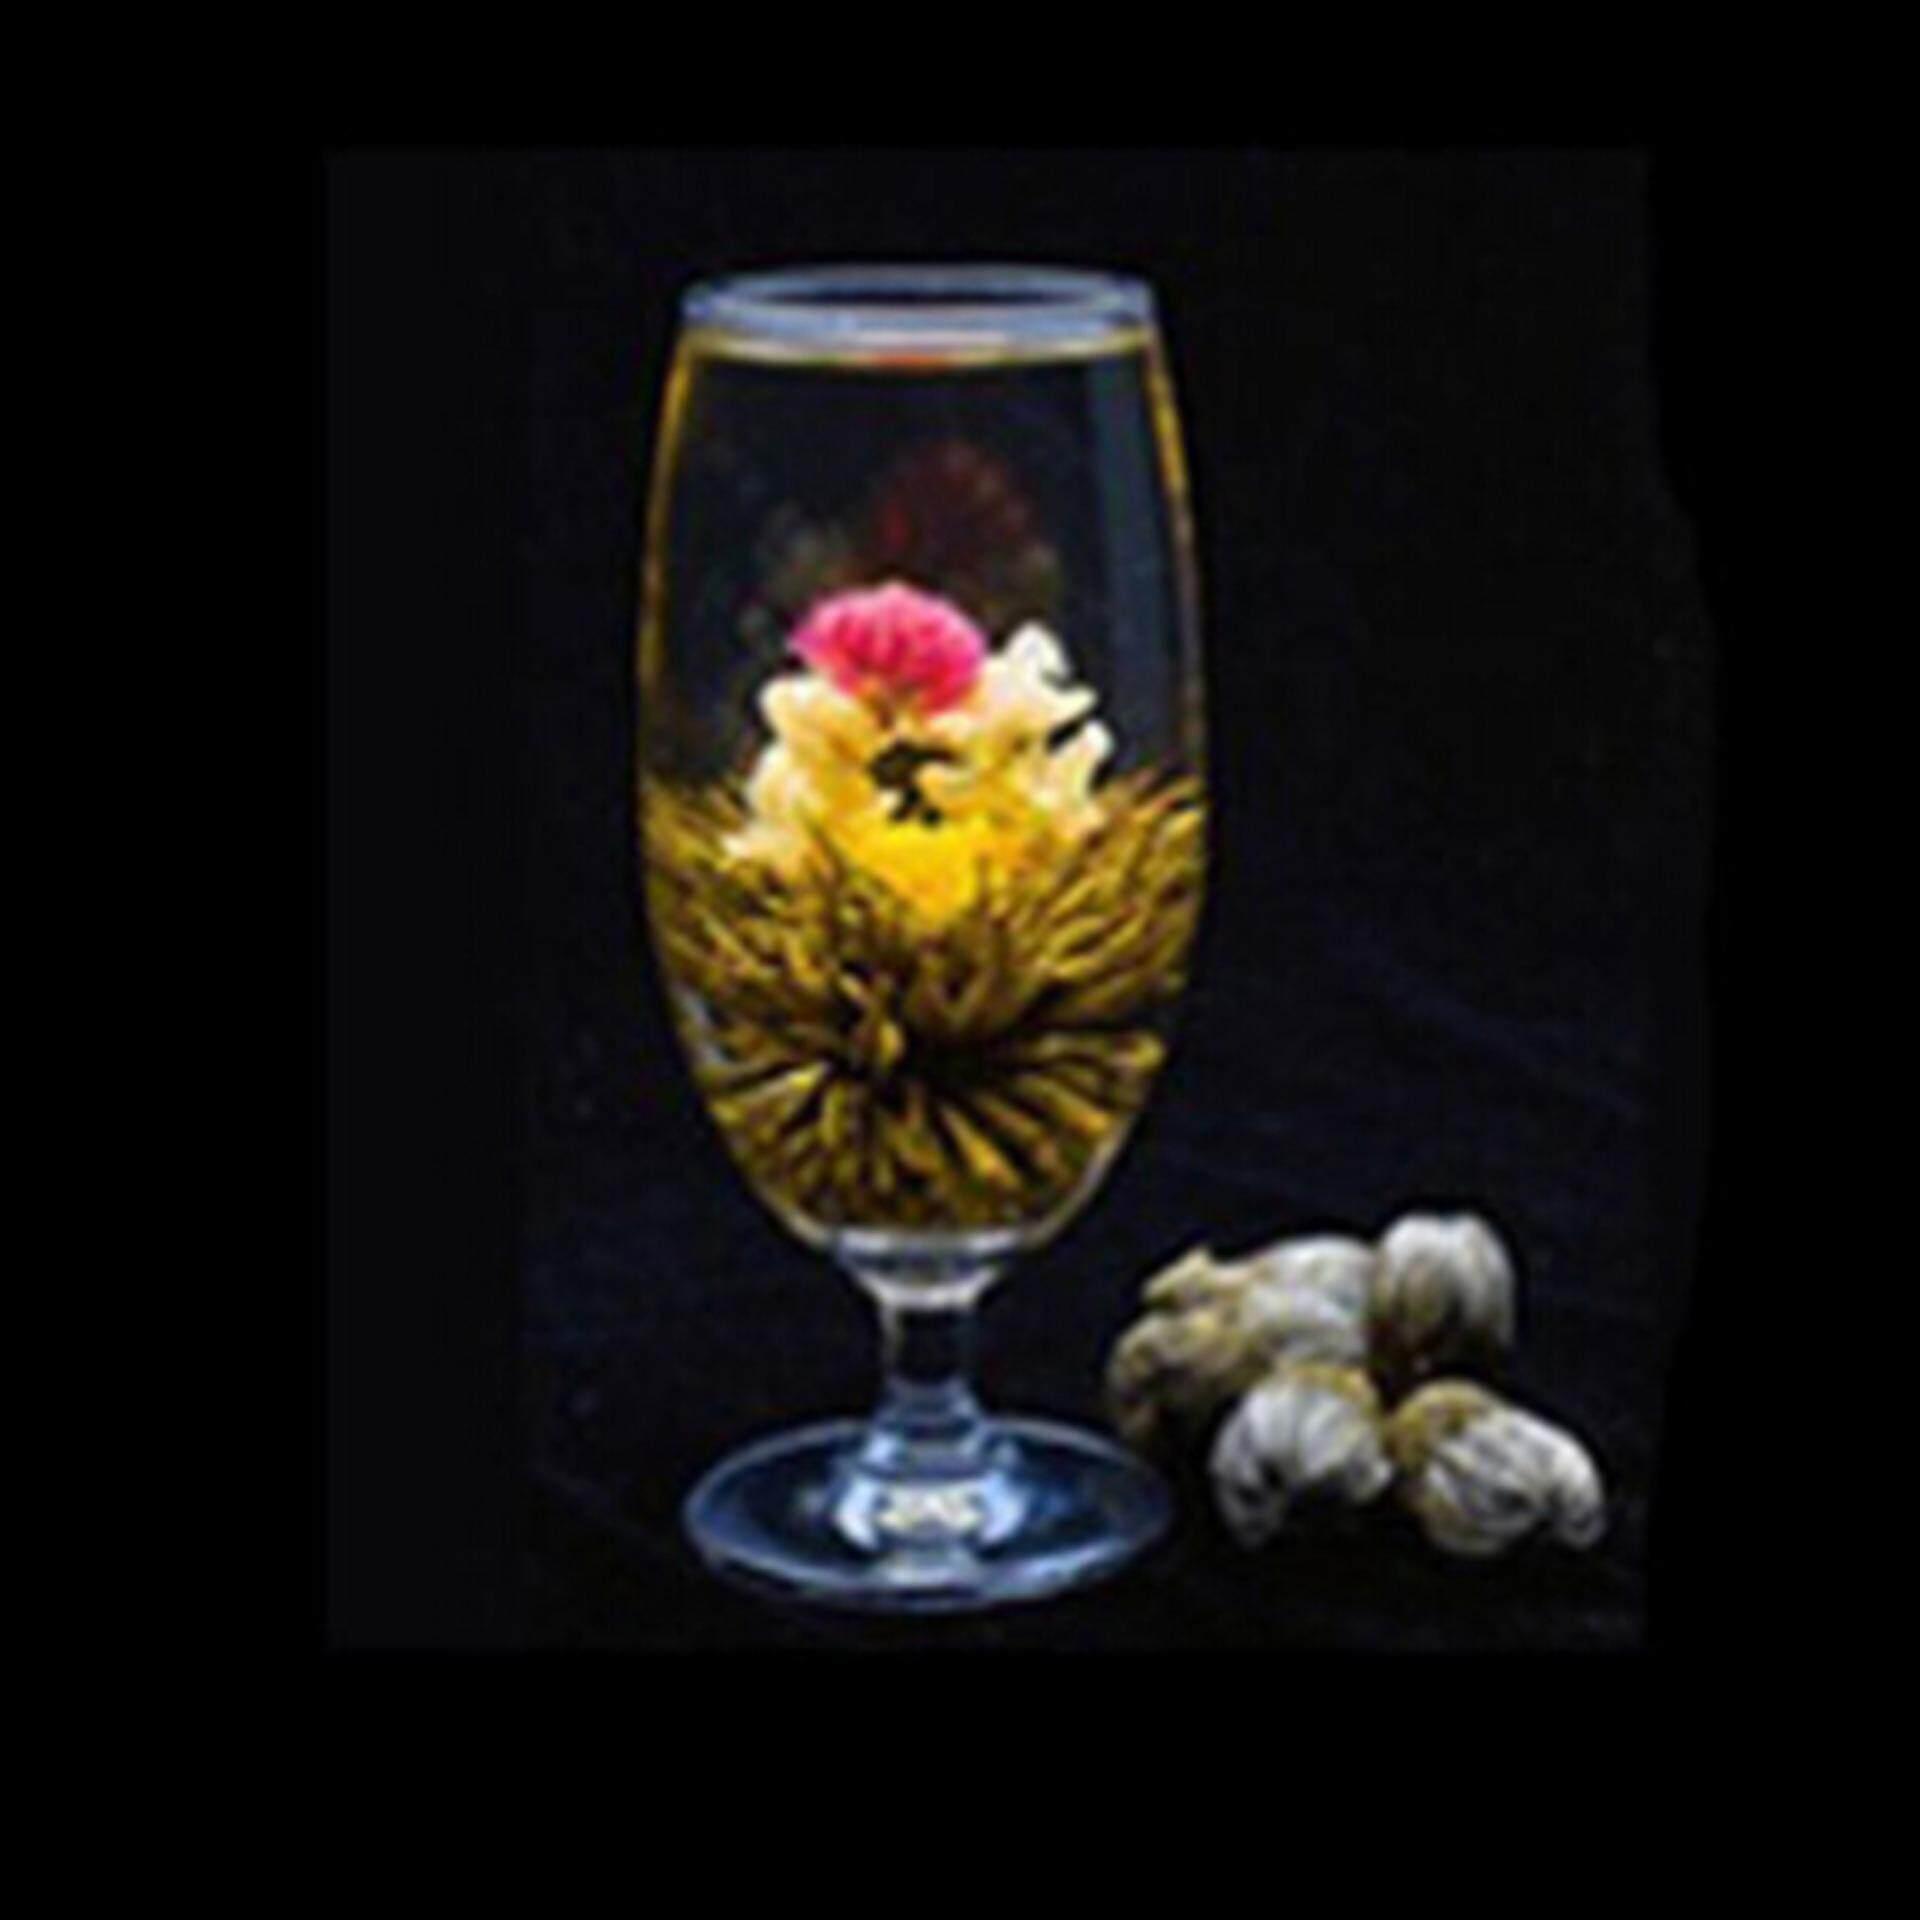 Hot Stylish Special Balls Handmade Blooming Flower Green Tea Gift - intl